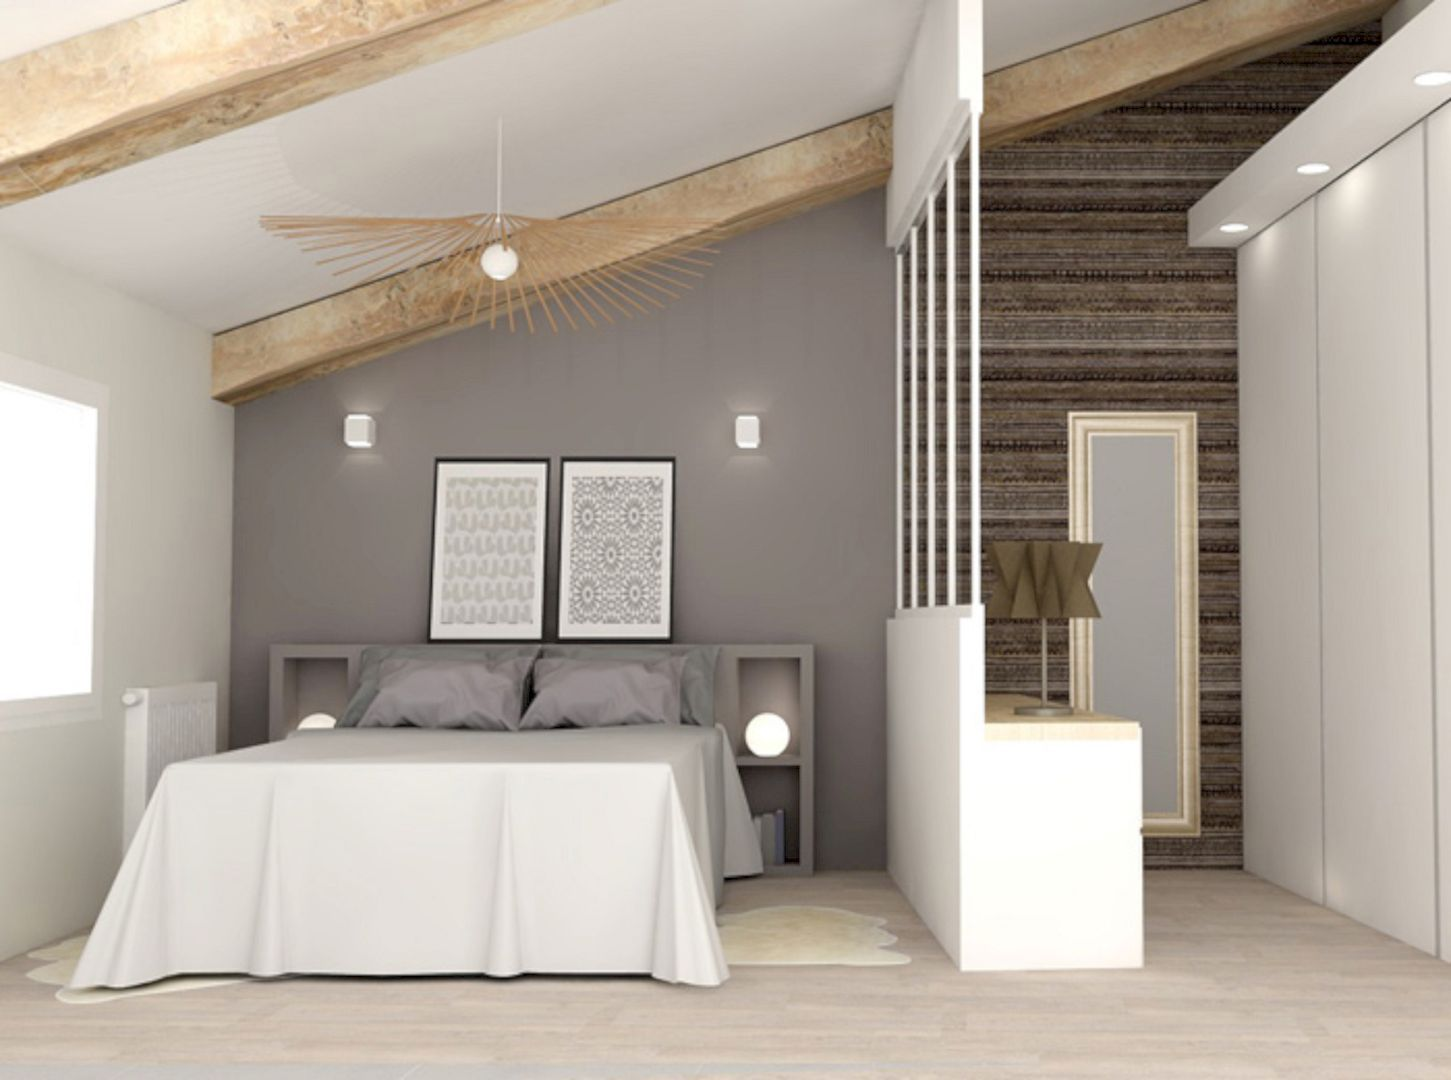 Lofty Solutions: 7 Essential Benefits of Loft Boarding #deptodublin